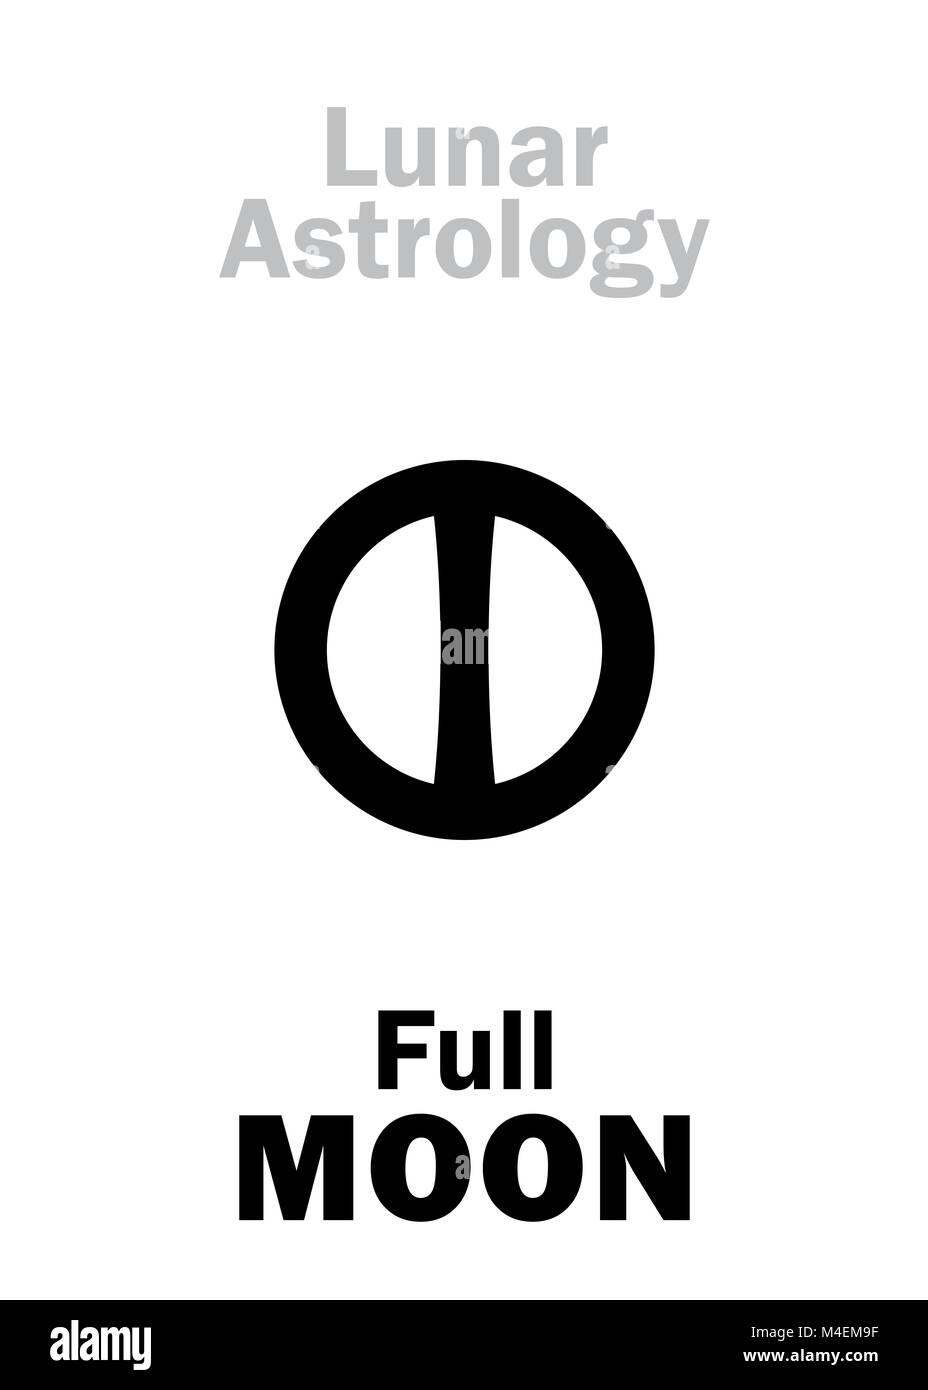 Astrology: Full MOON - Stock Image